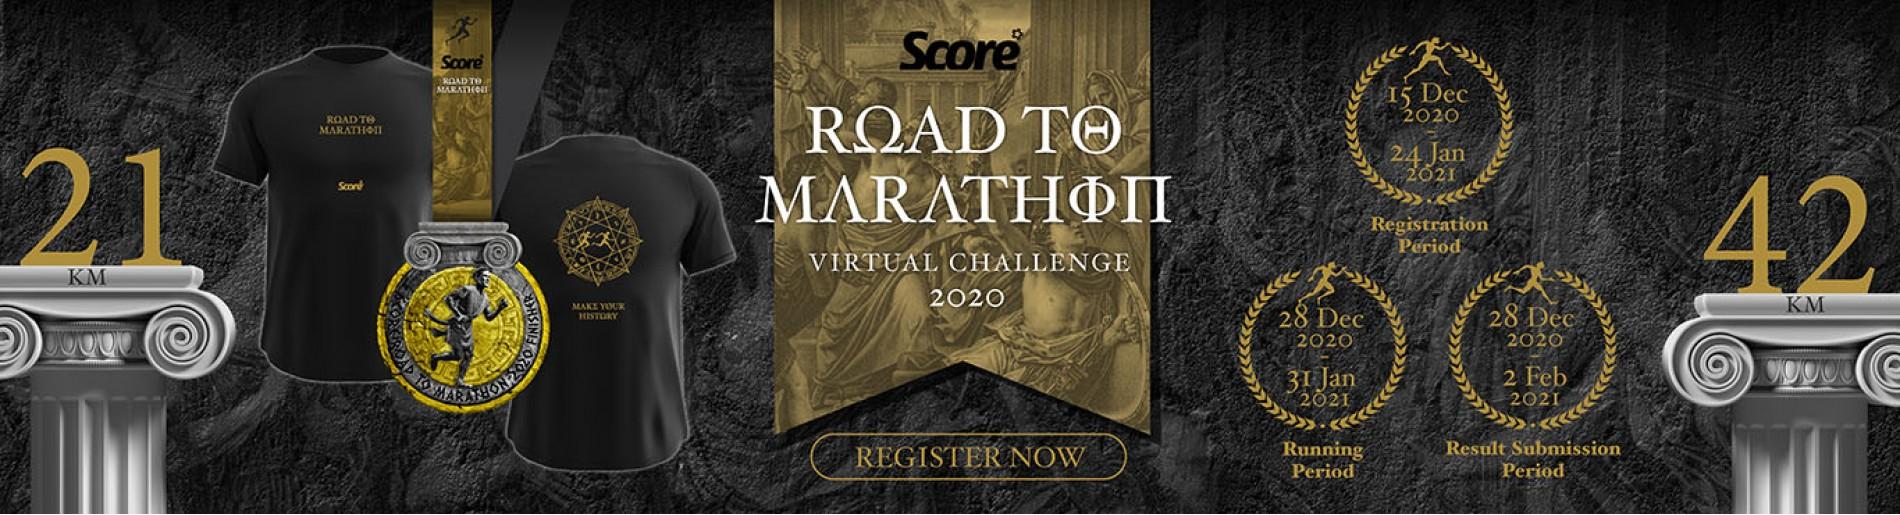 SCORE Road To Marathon 2021